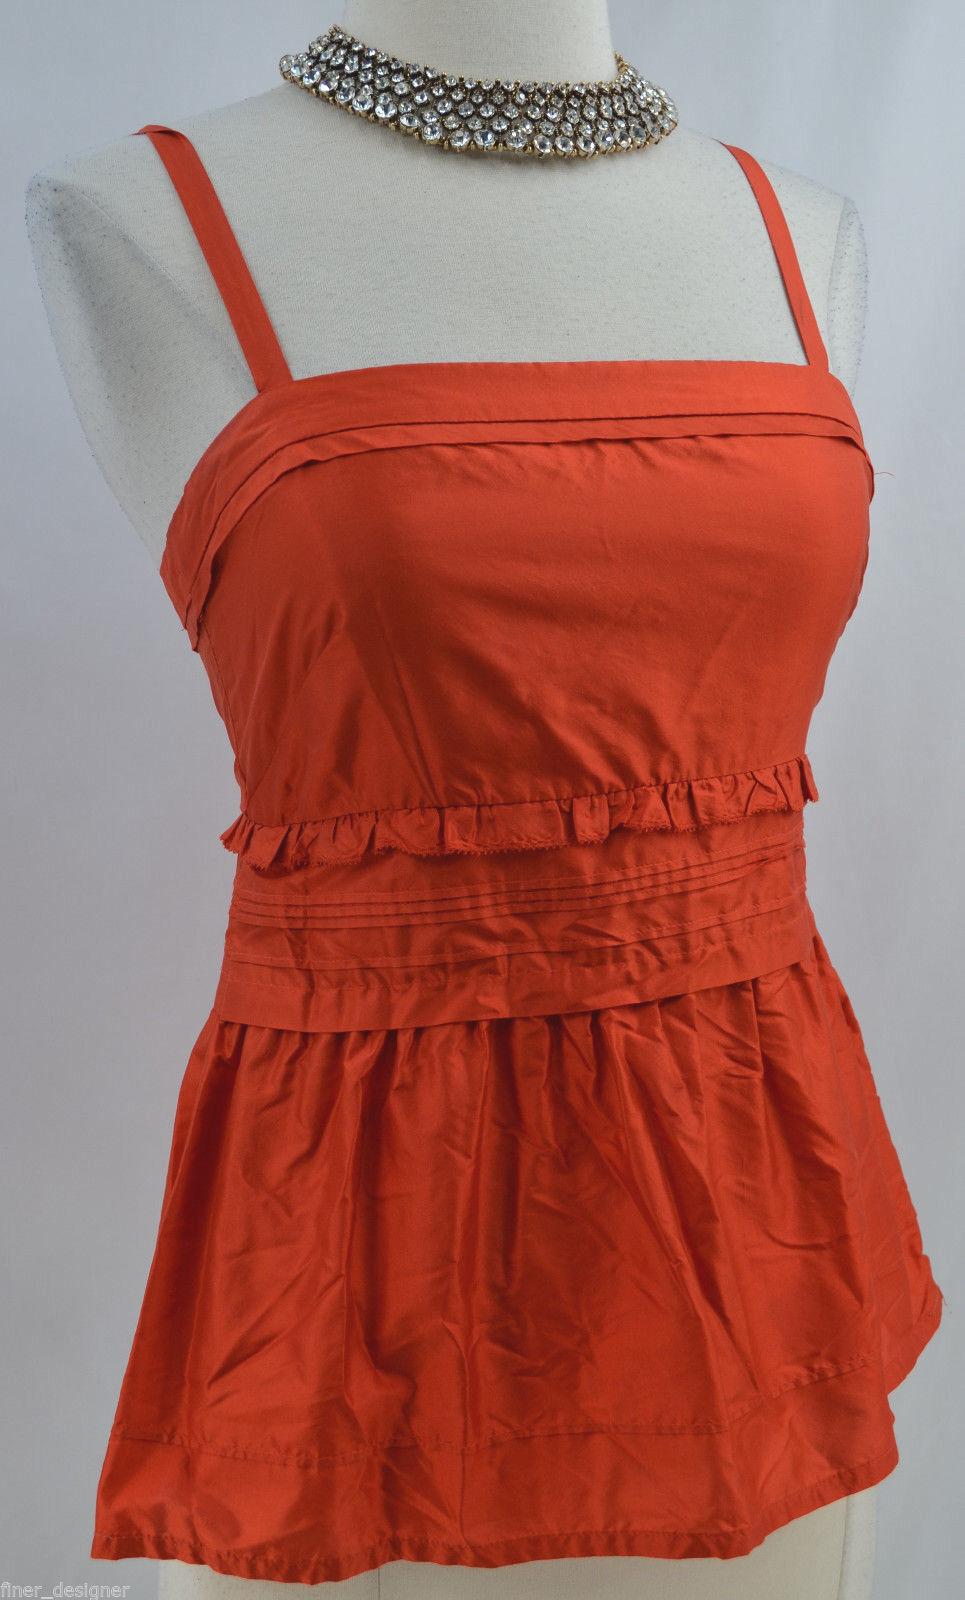 J J. Crew 100% silk cami ruffle Top Blouse shirt orange adj strap SIZE 0 S NEW